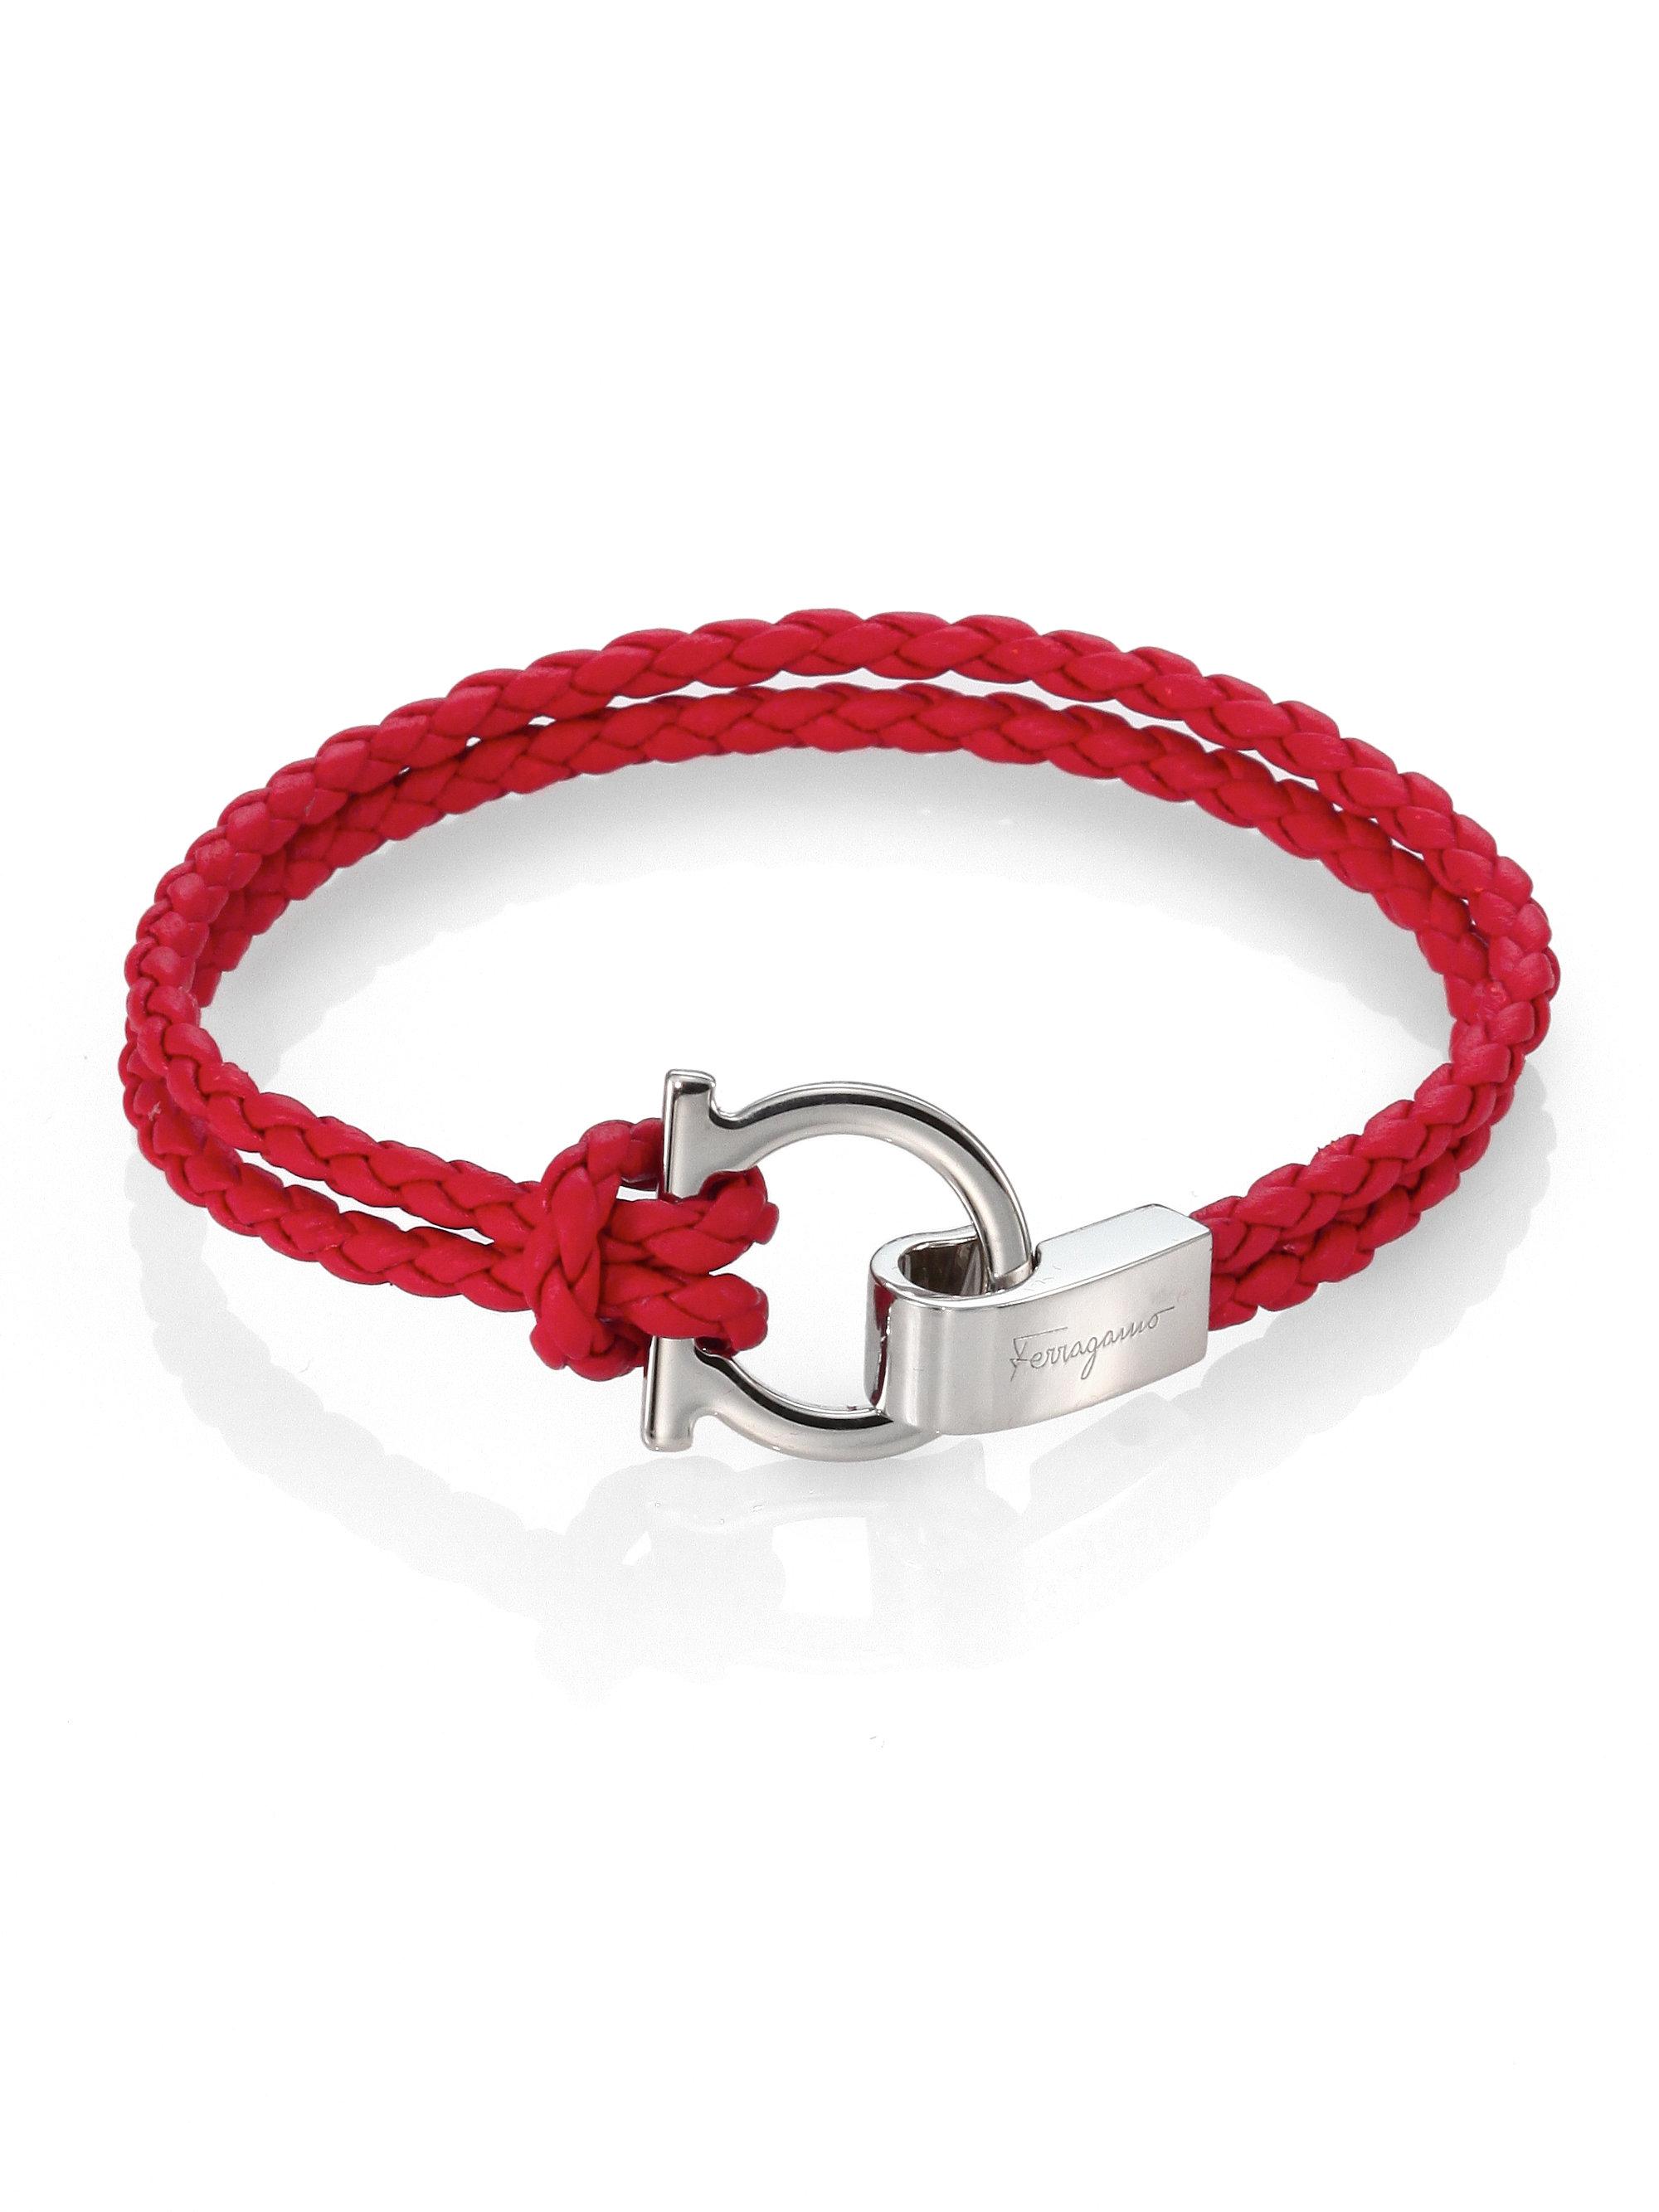 Ferragamo Braided Leather Gancini Bracelet In Red For Men